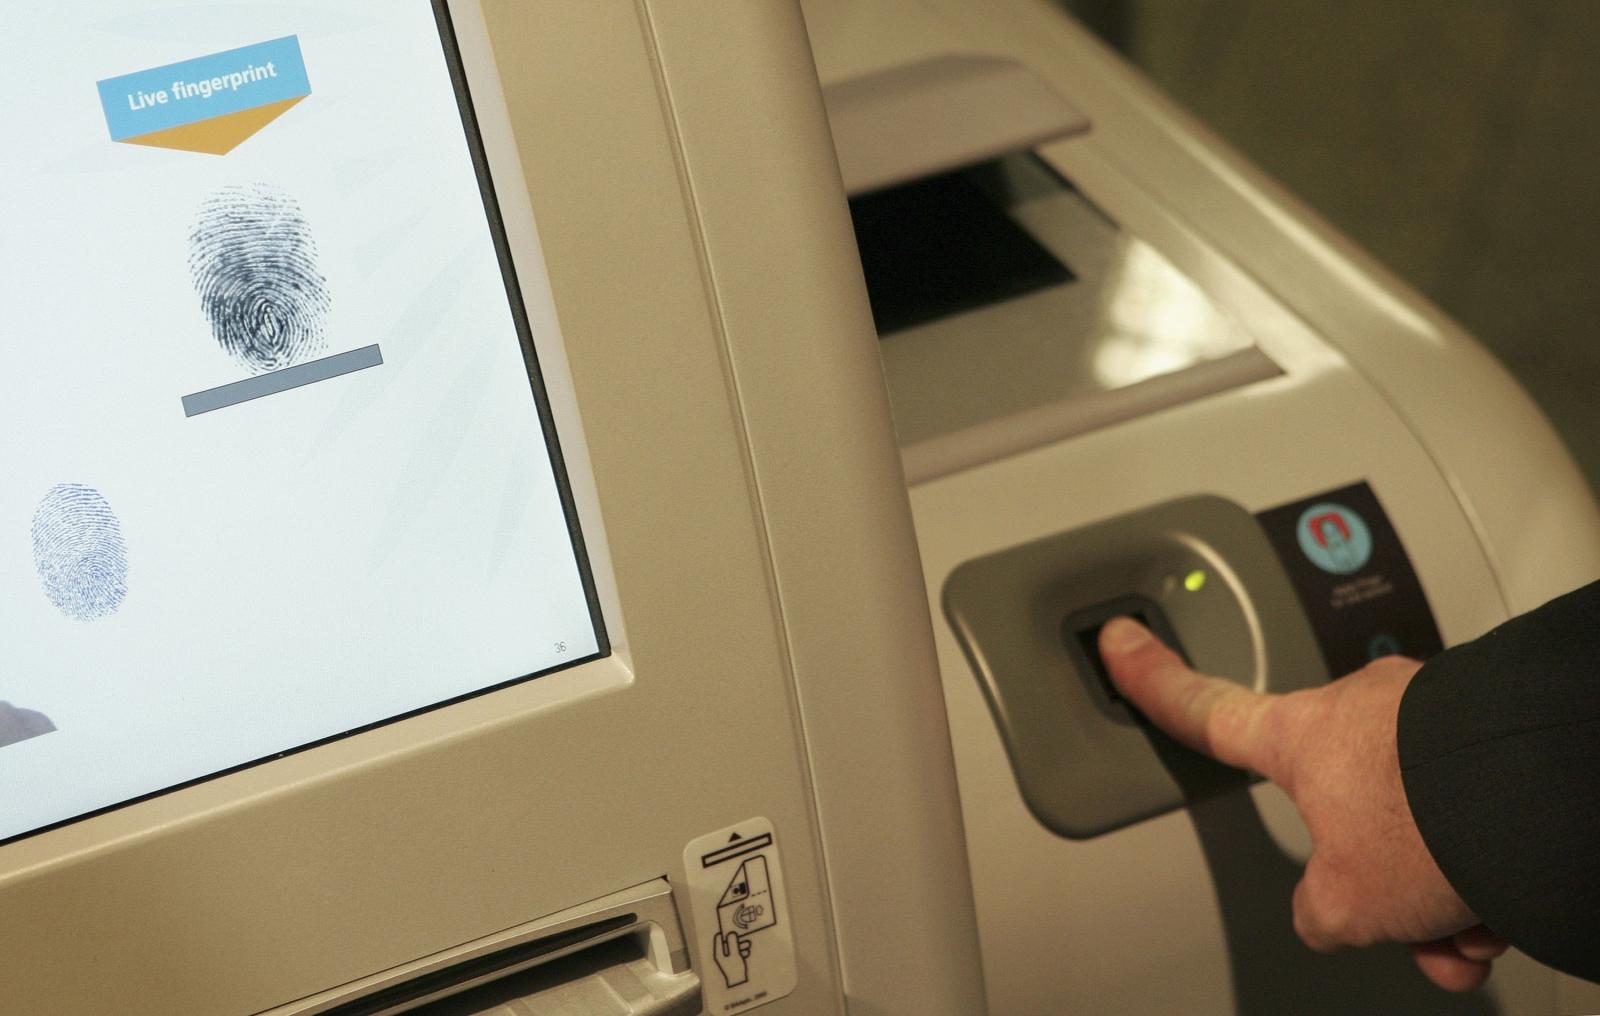 UK railways to use biometric technology